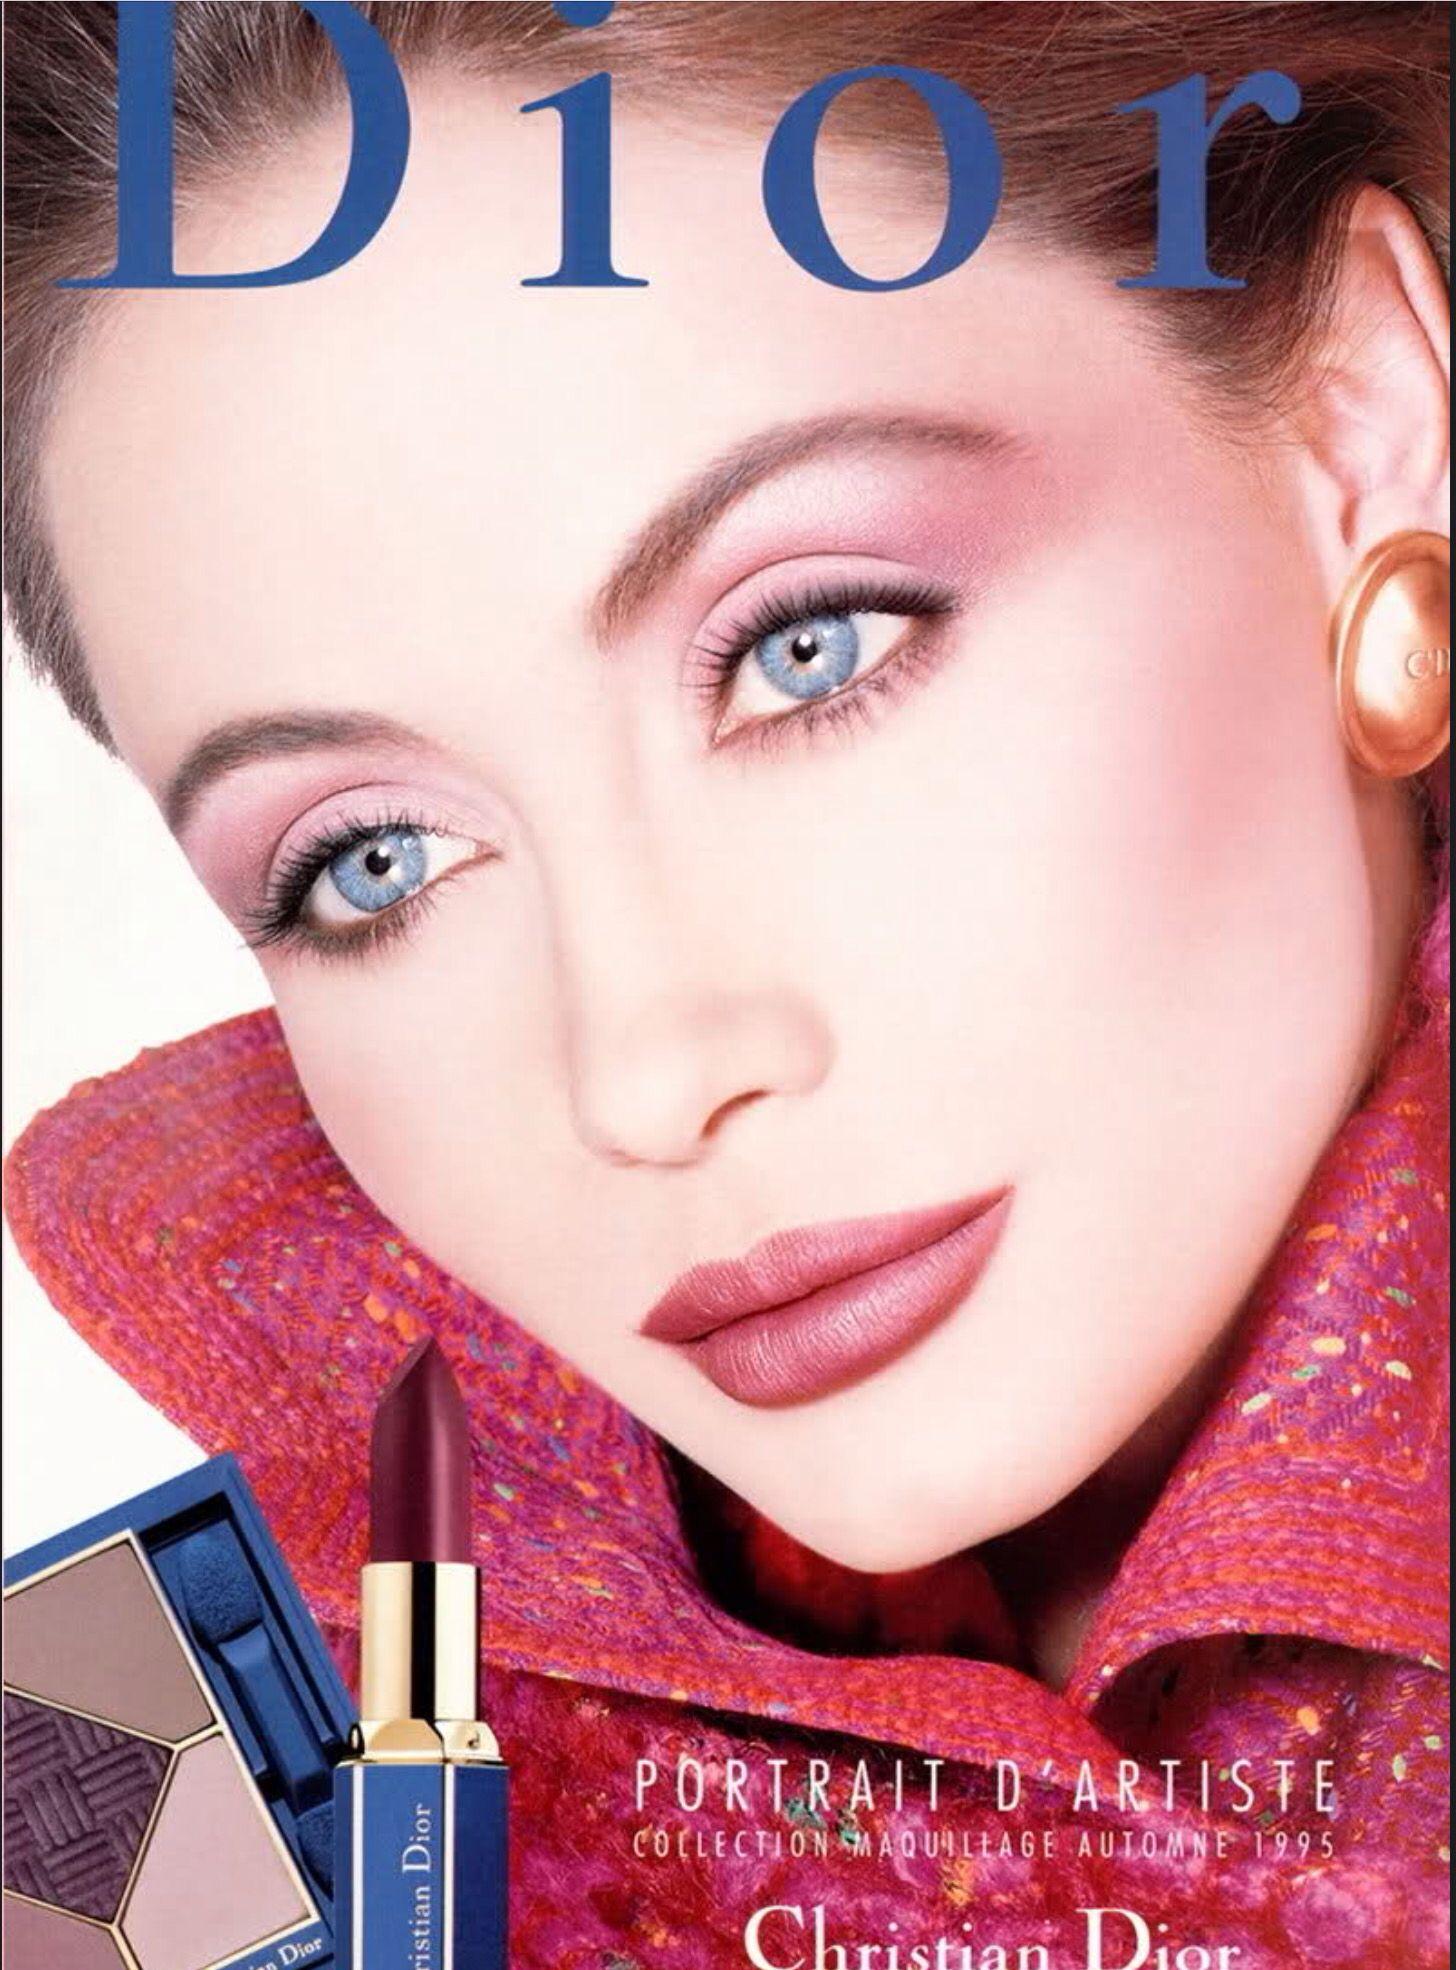 17d4fa89ae1 Christian Dior Makeup Fall 1995   Vintage Ad & Fashion in 2019 ...